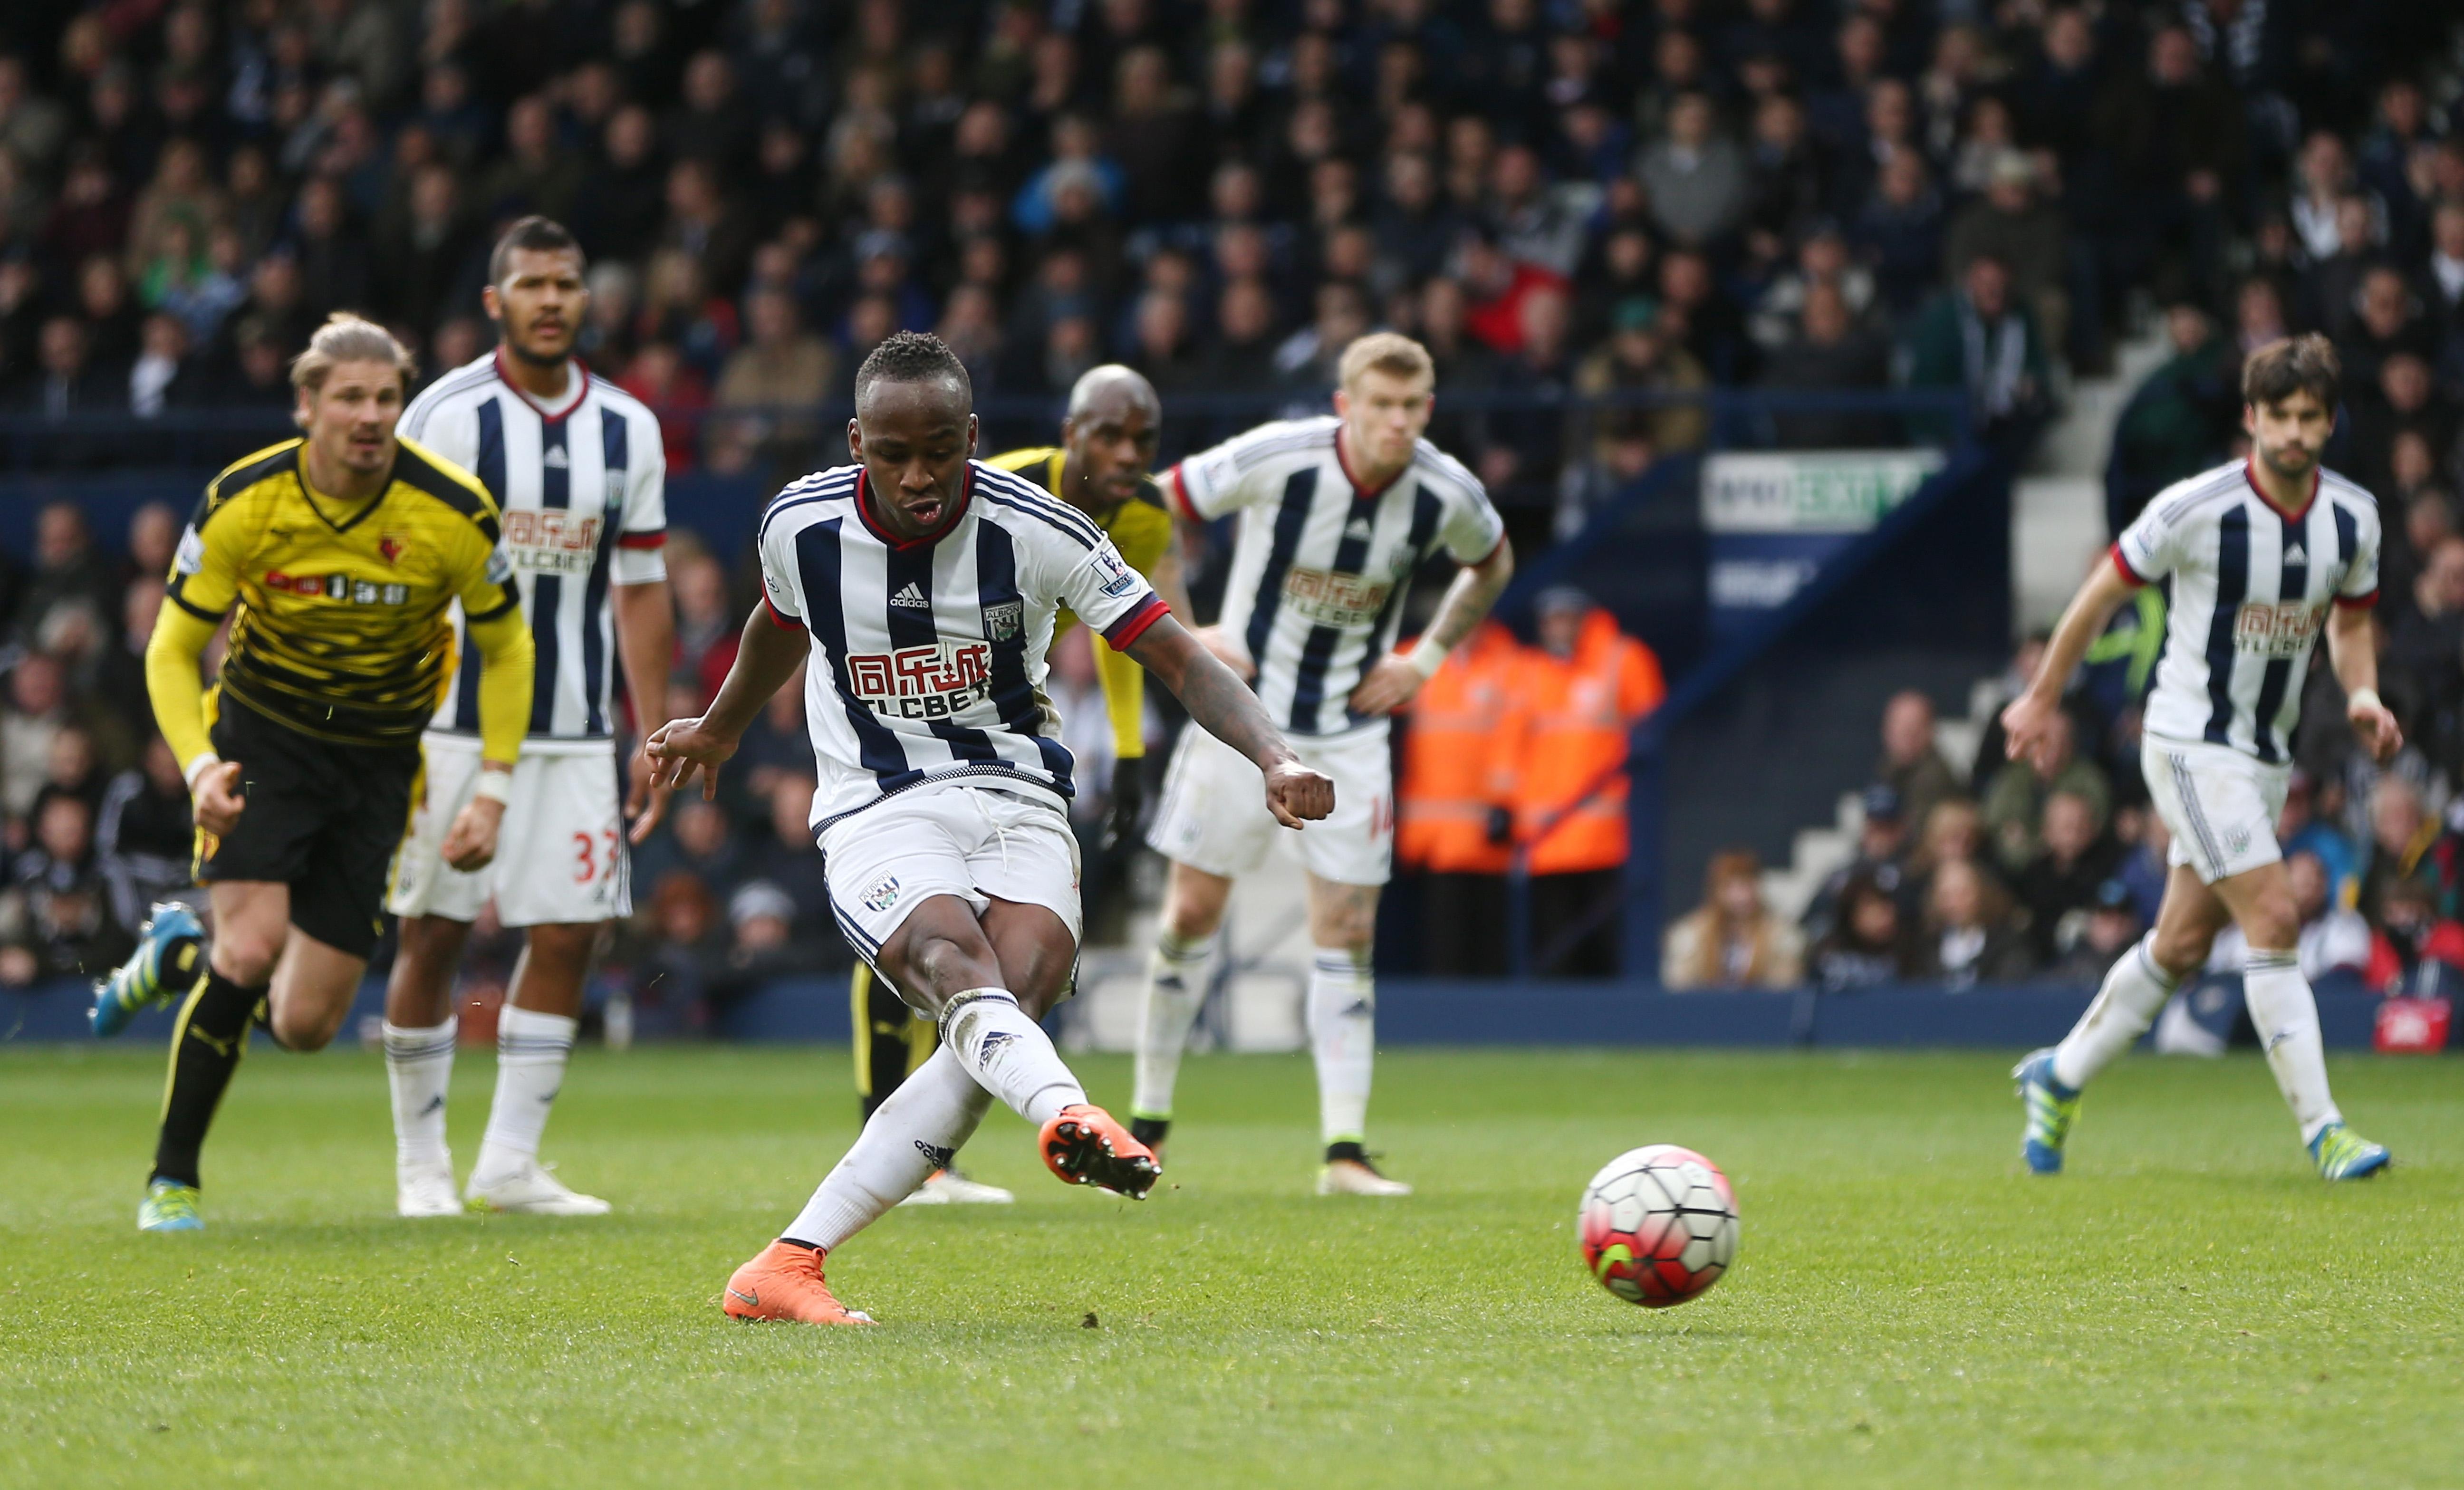 Tottenham Hotspur would lead race for Saido Berahino transfer, admits Stoke boss Mark Hughes